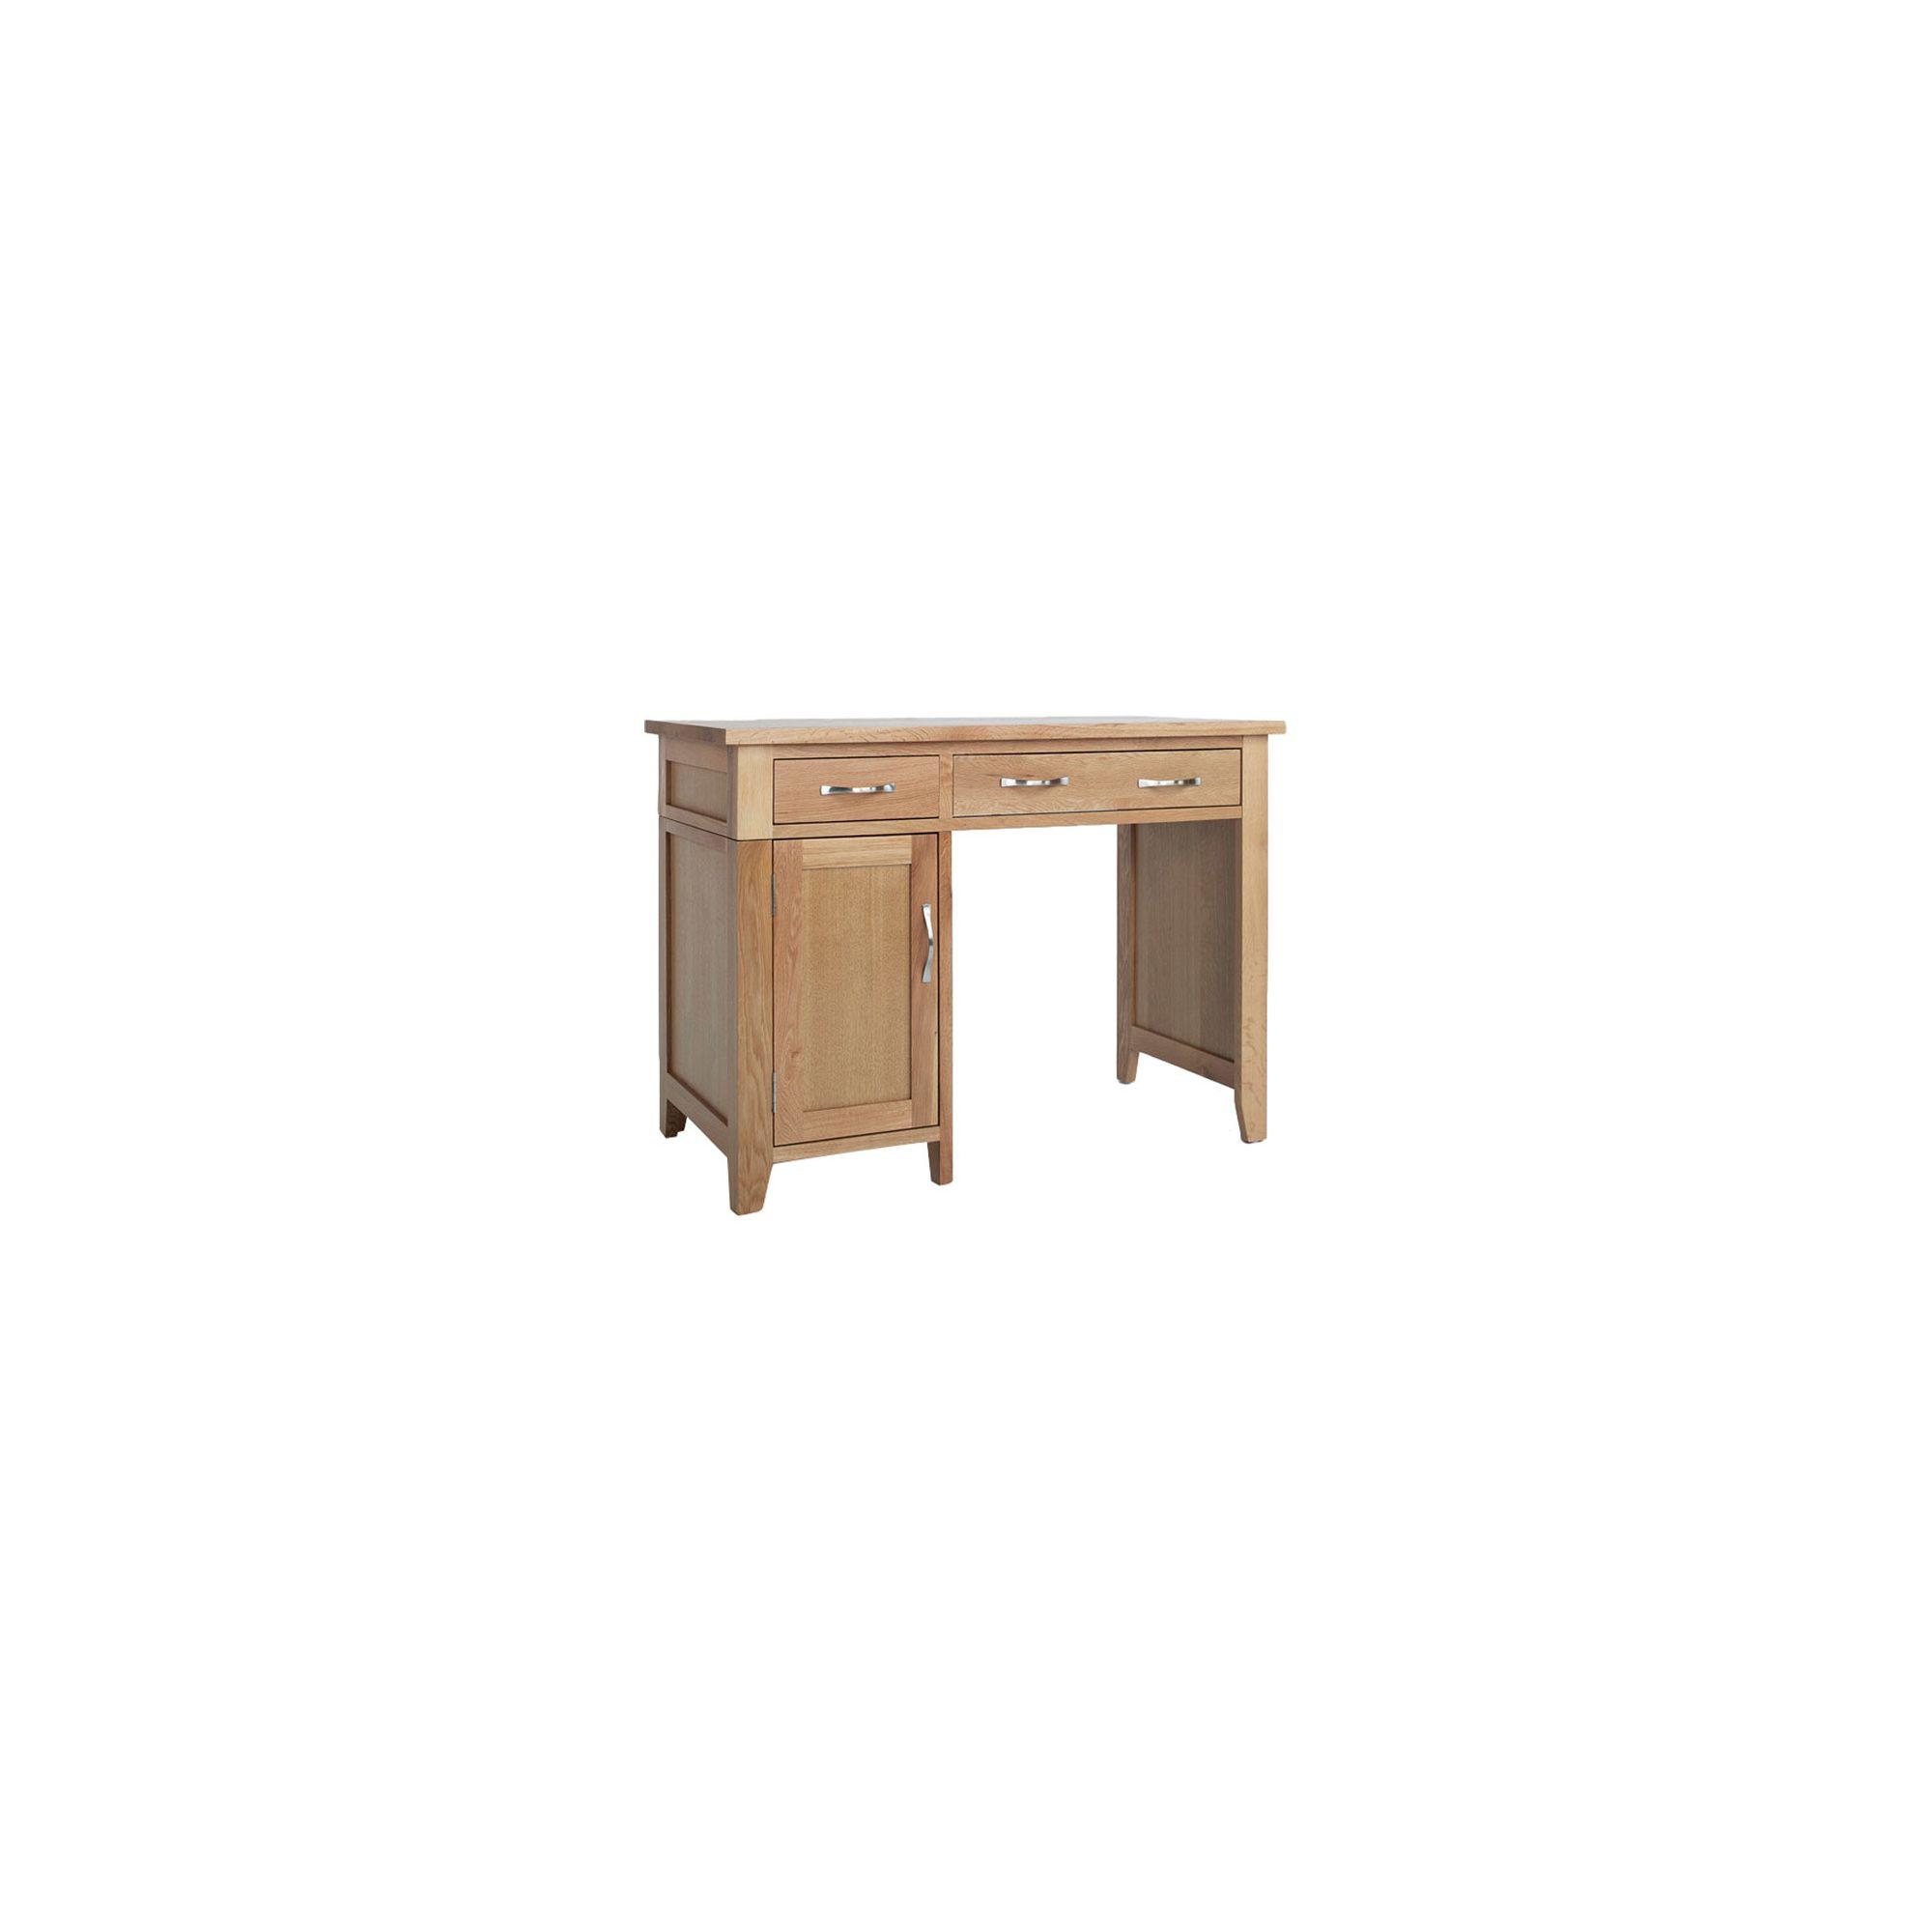 Ametis Sherwood Oak Single Pedestal Desk at Tesco Direct